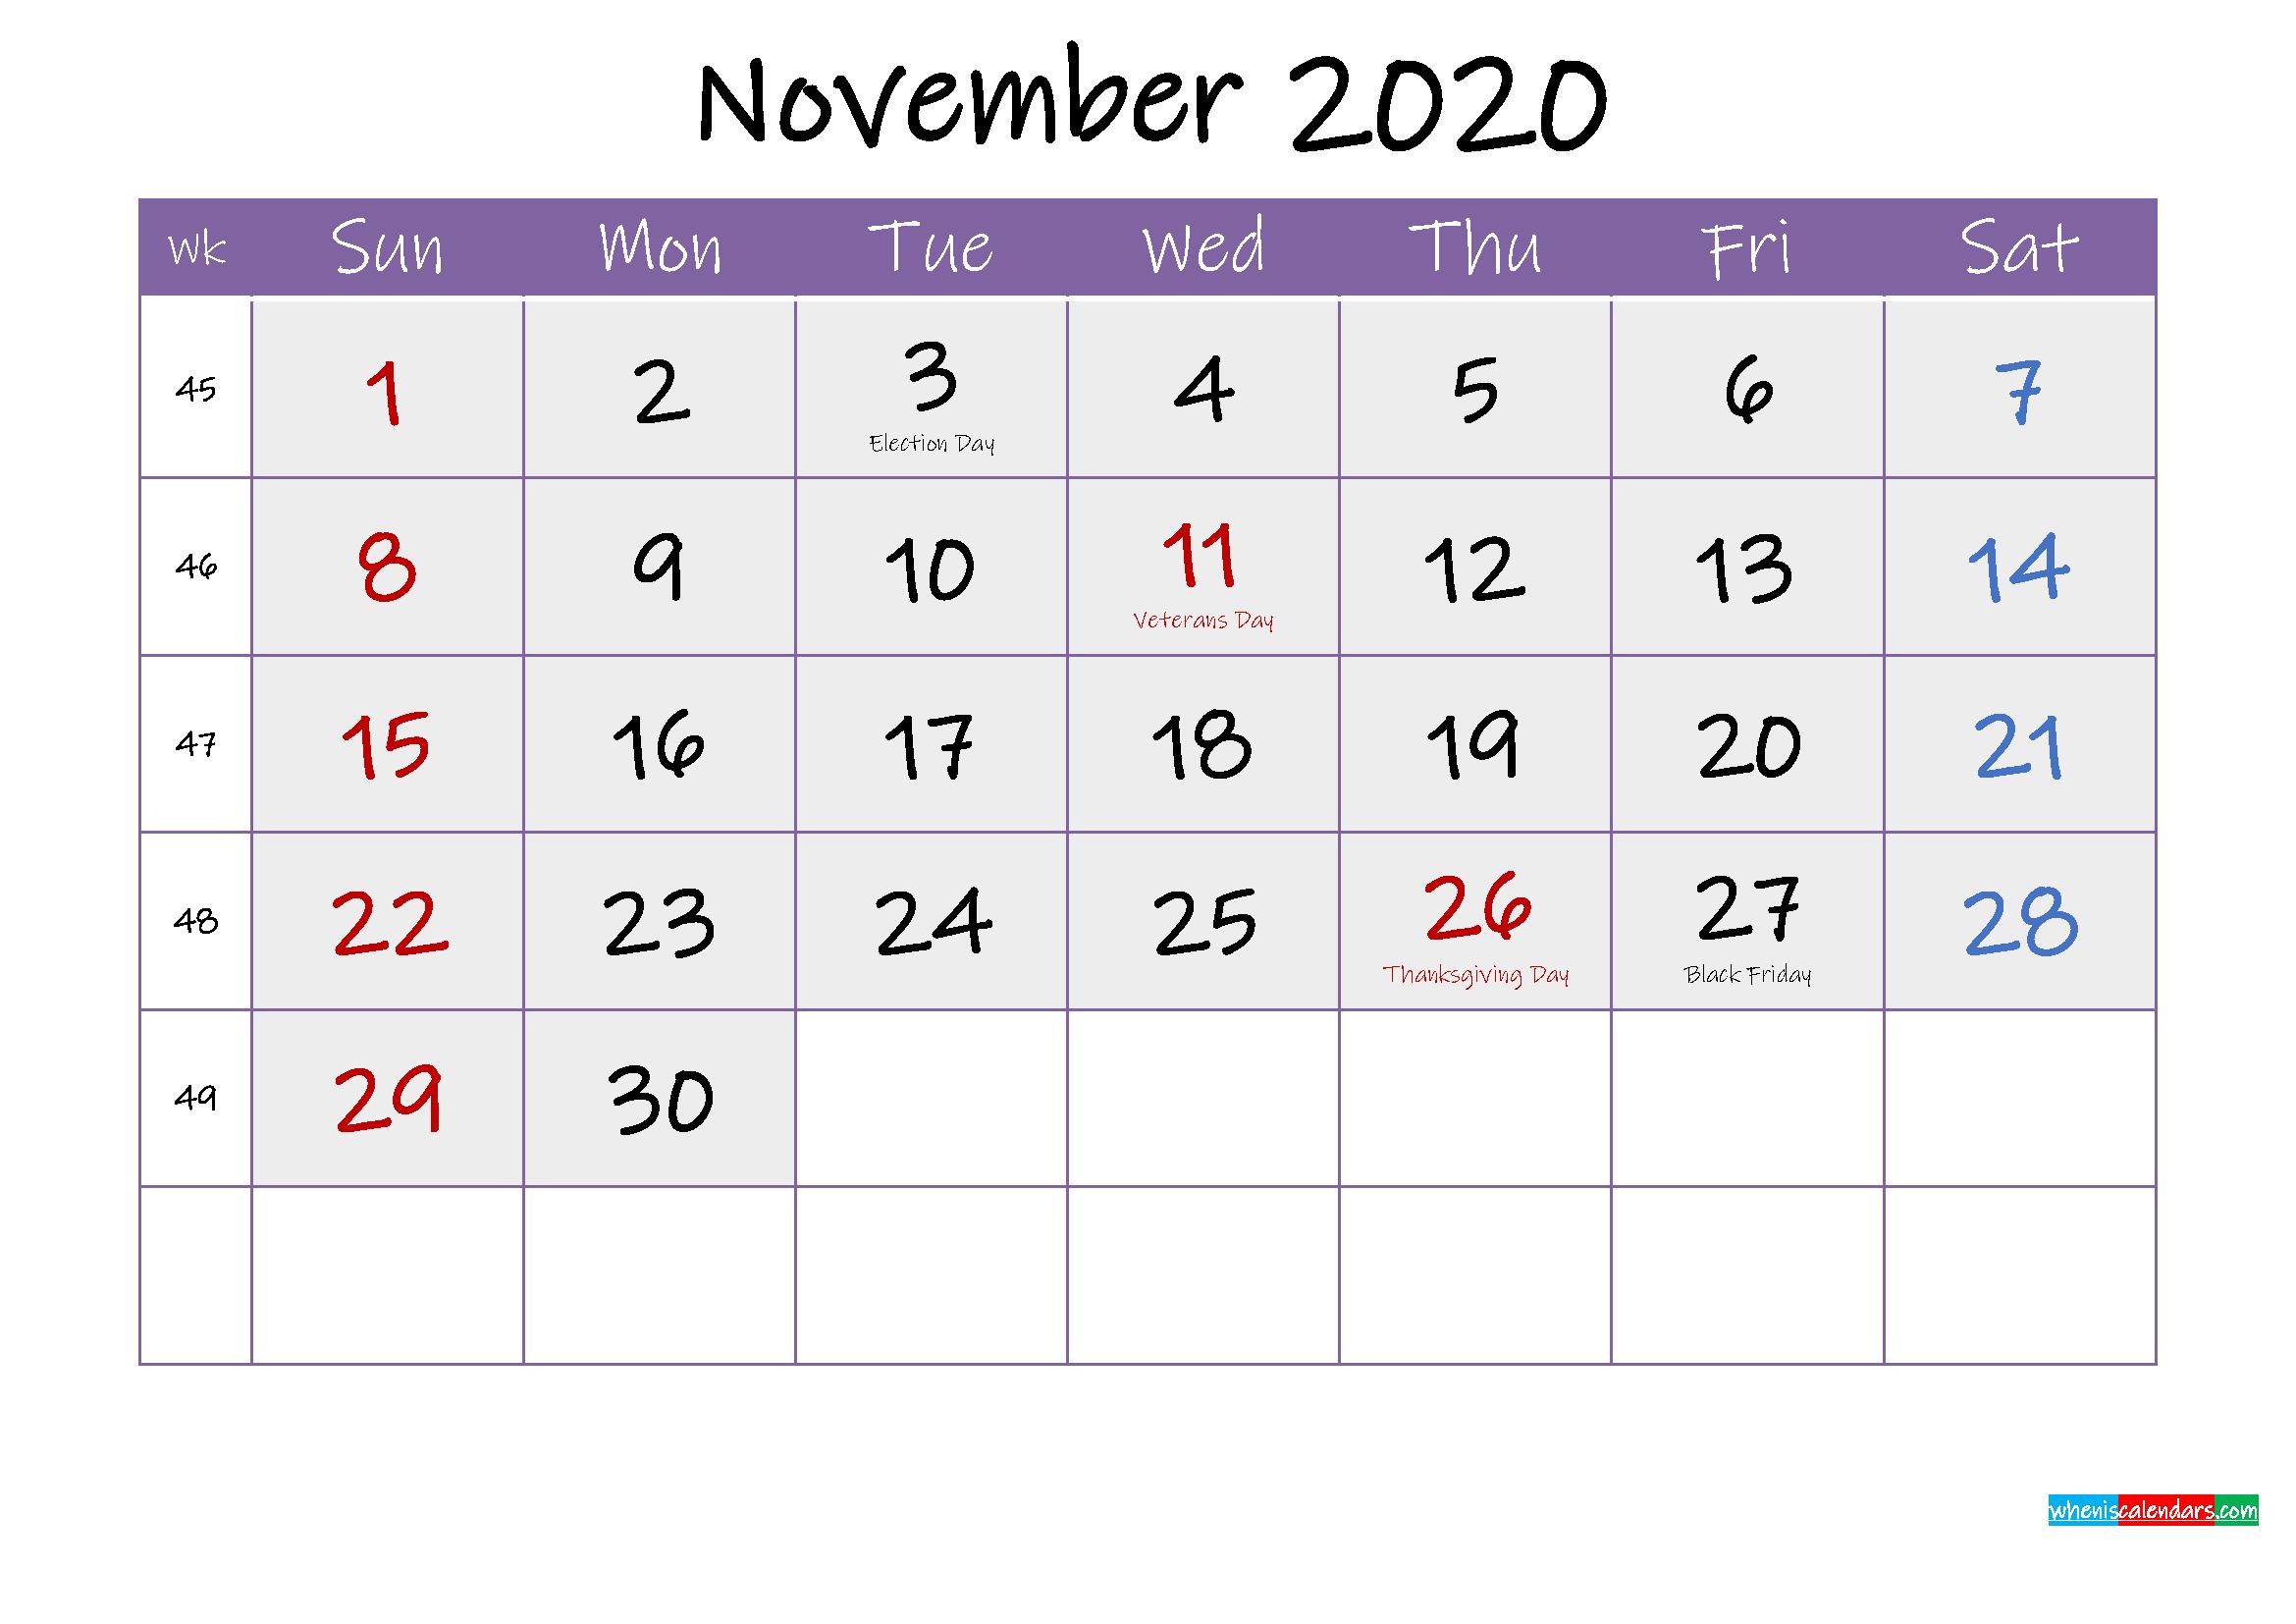 Free November 2020 Printable Calendar with Holidays